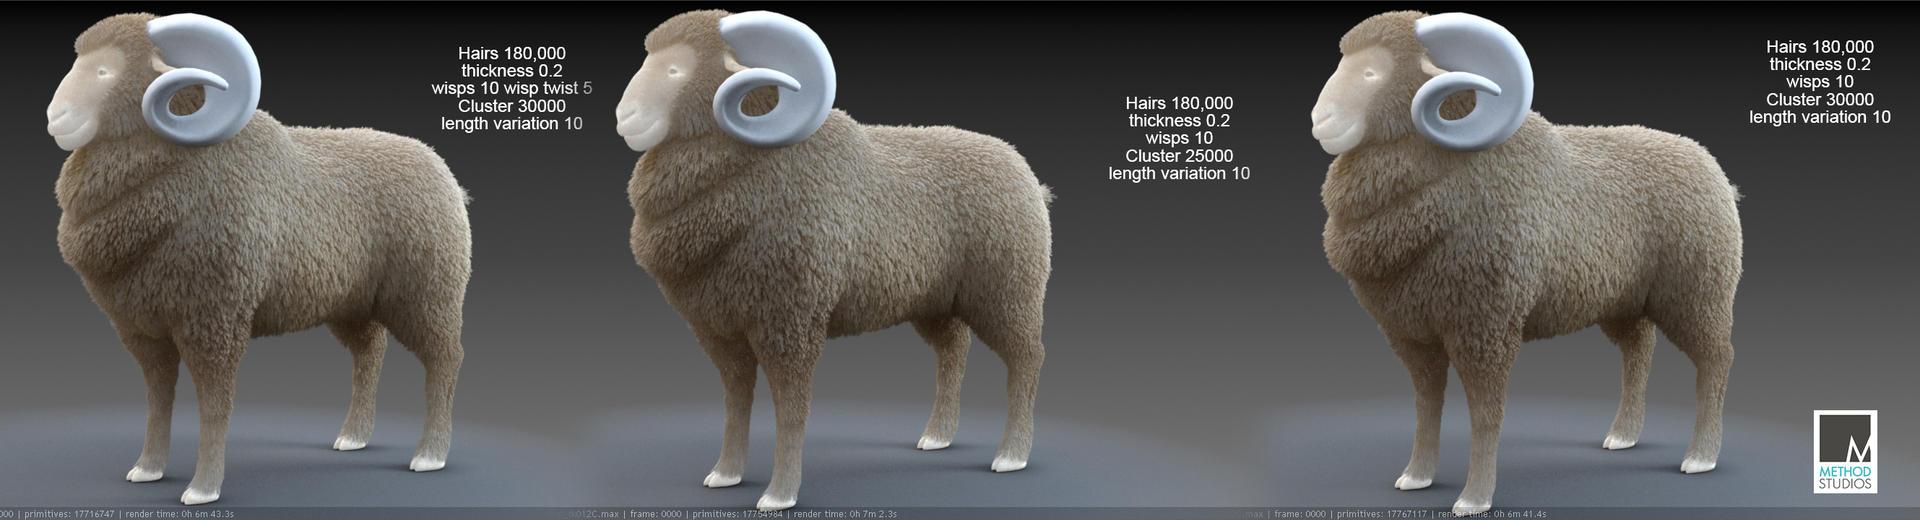 Rams wips